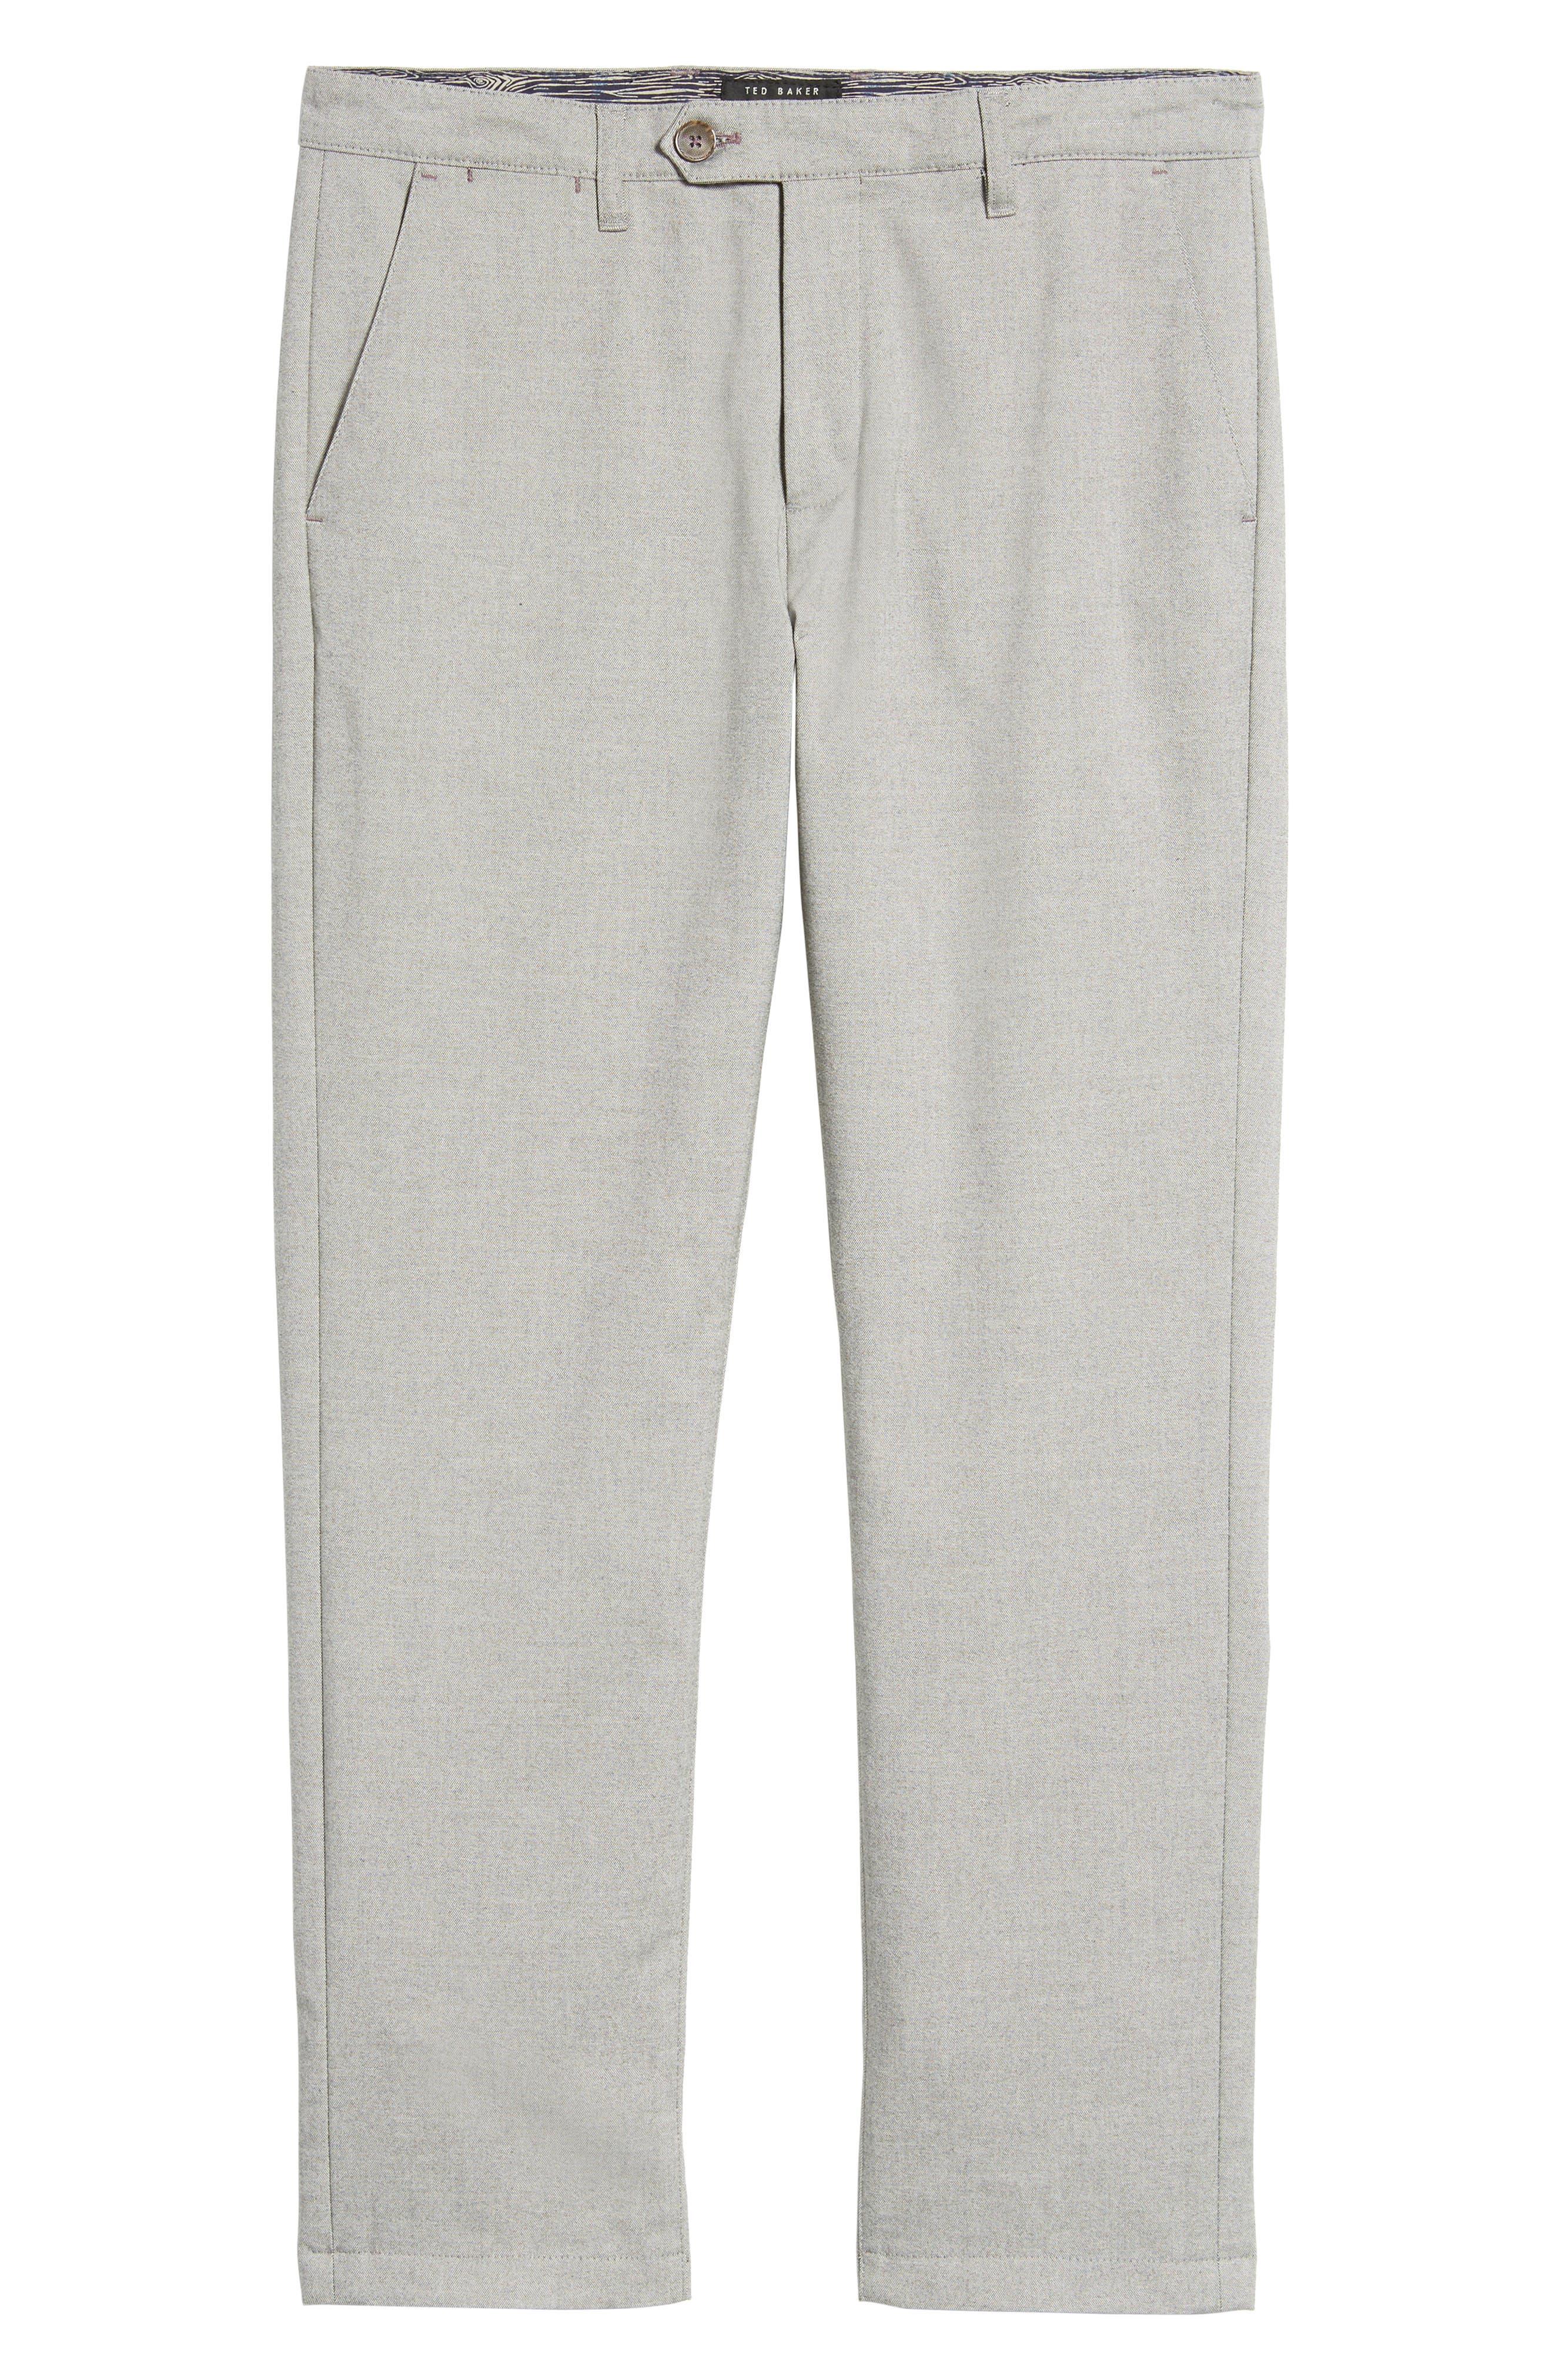 Modern Slim Fit Trousers,                             Alternate thumbnail 17, color,